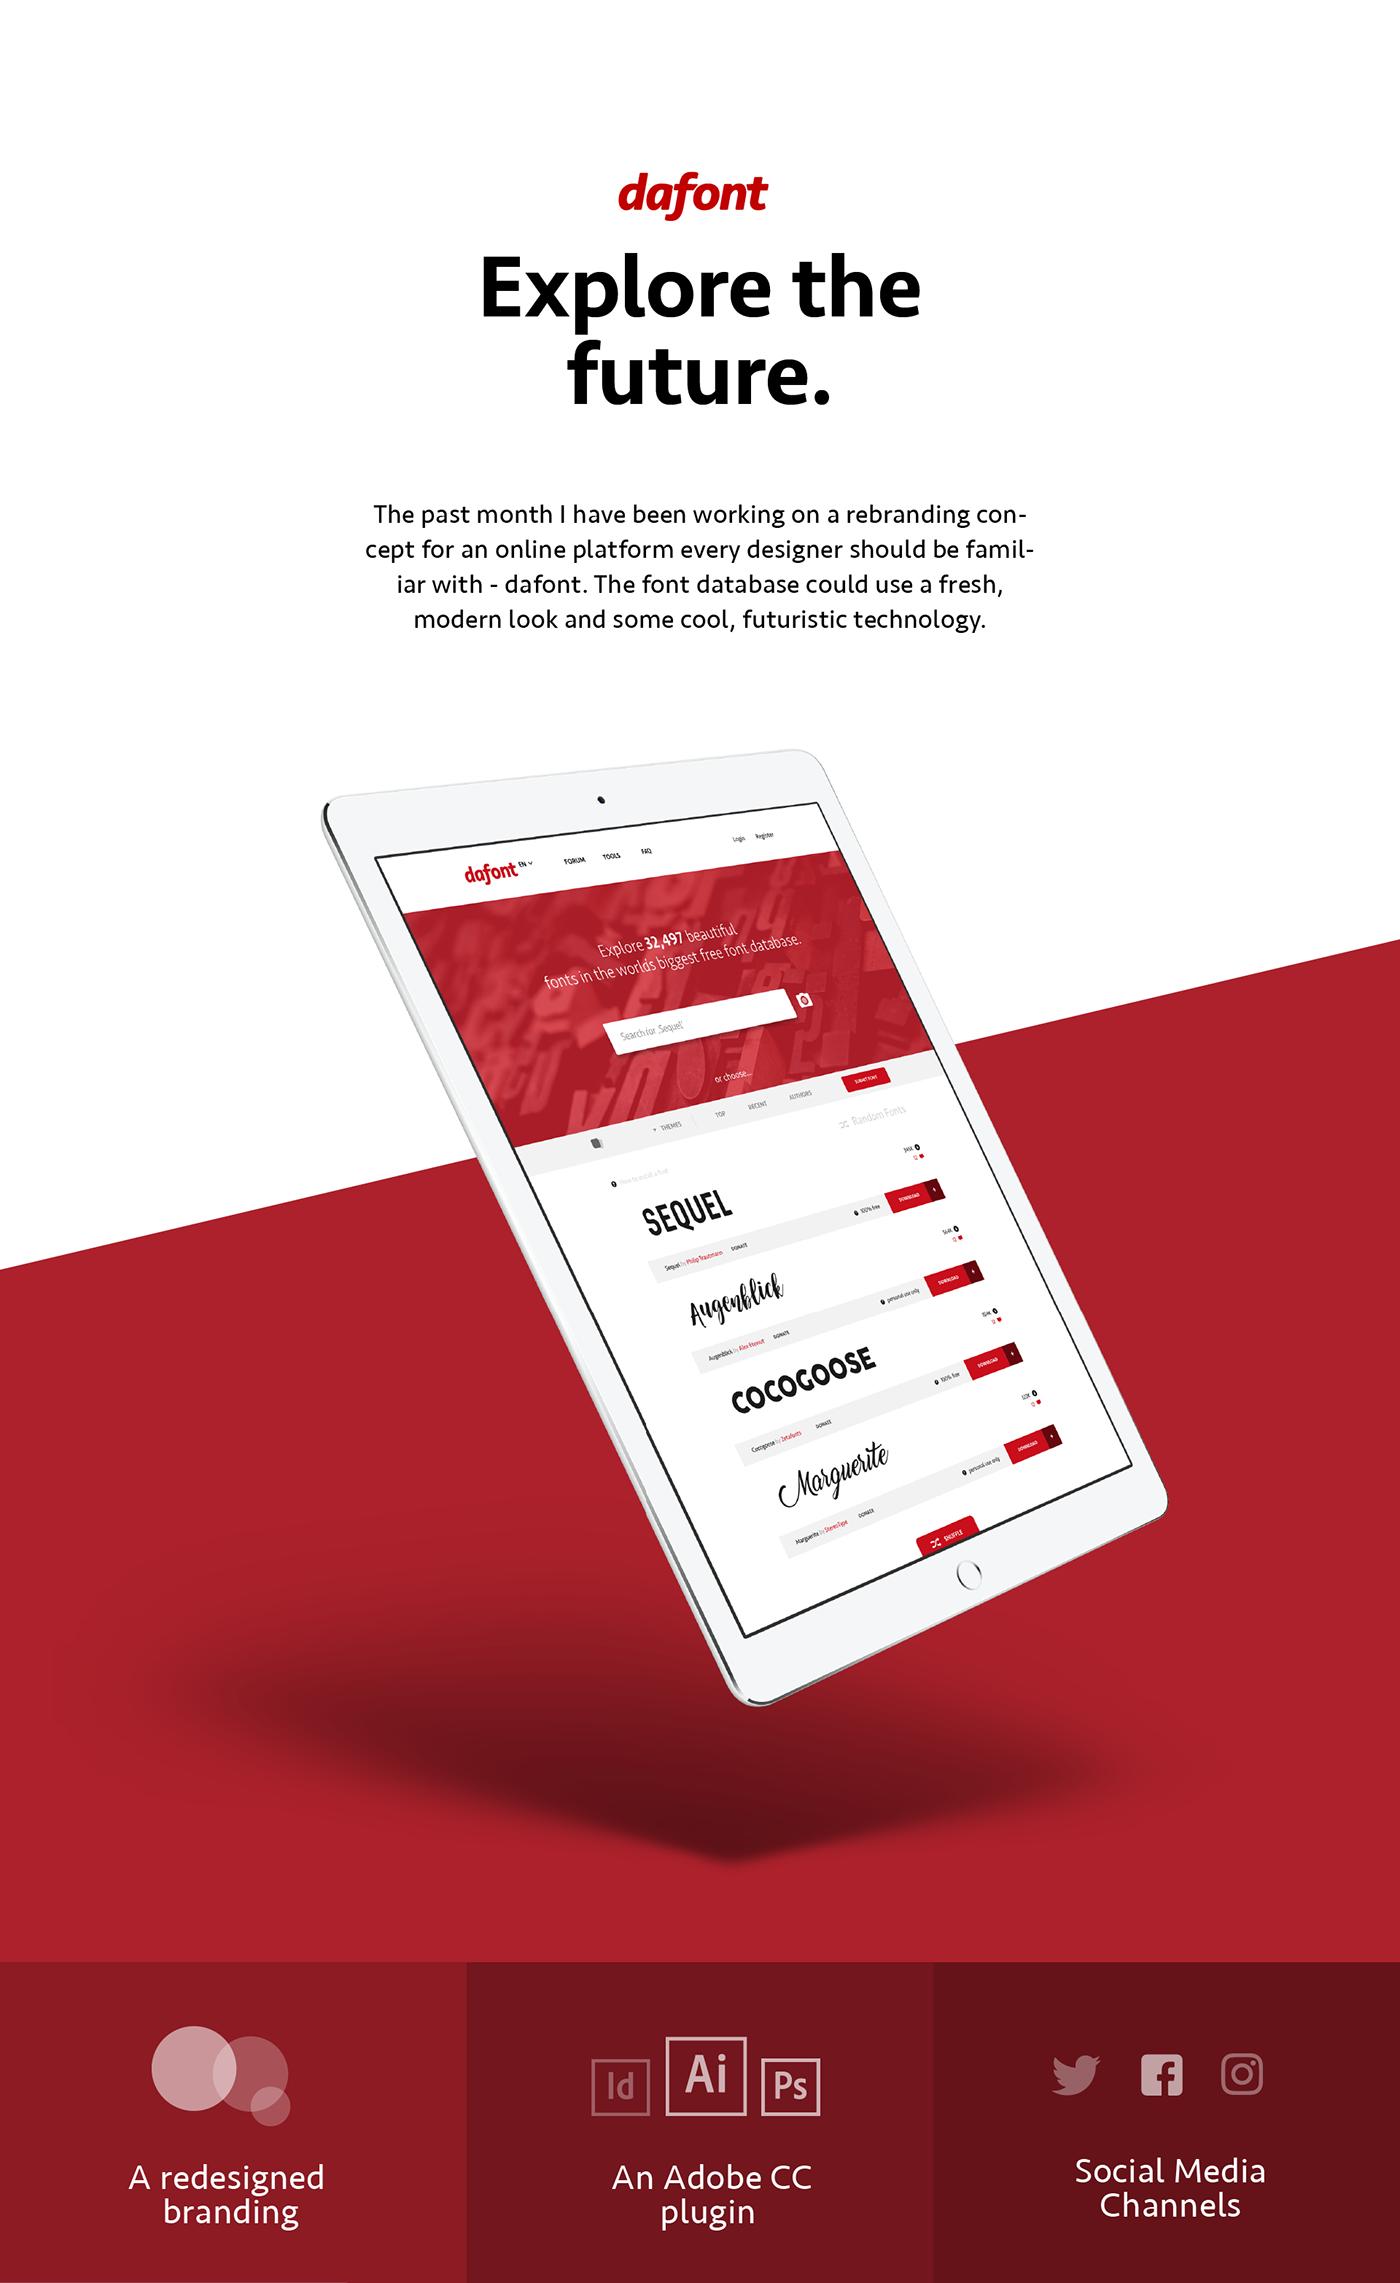 dafont rebranding concept - explore the future on Behance